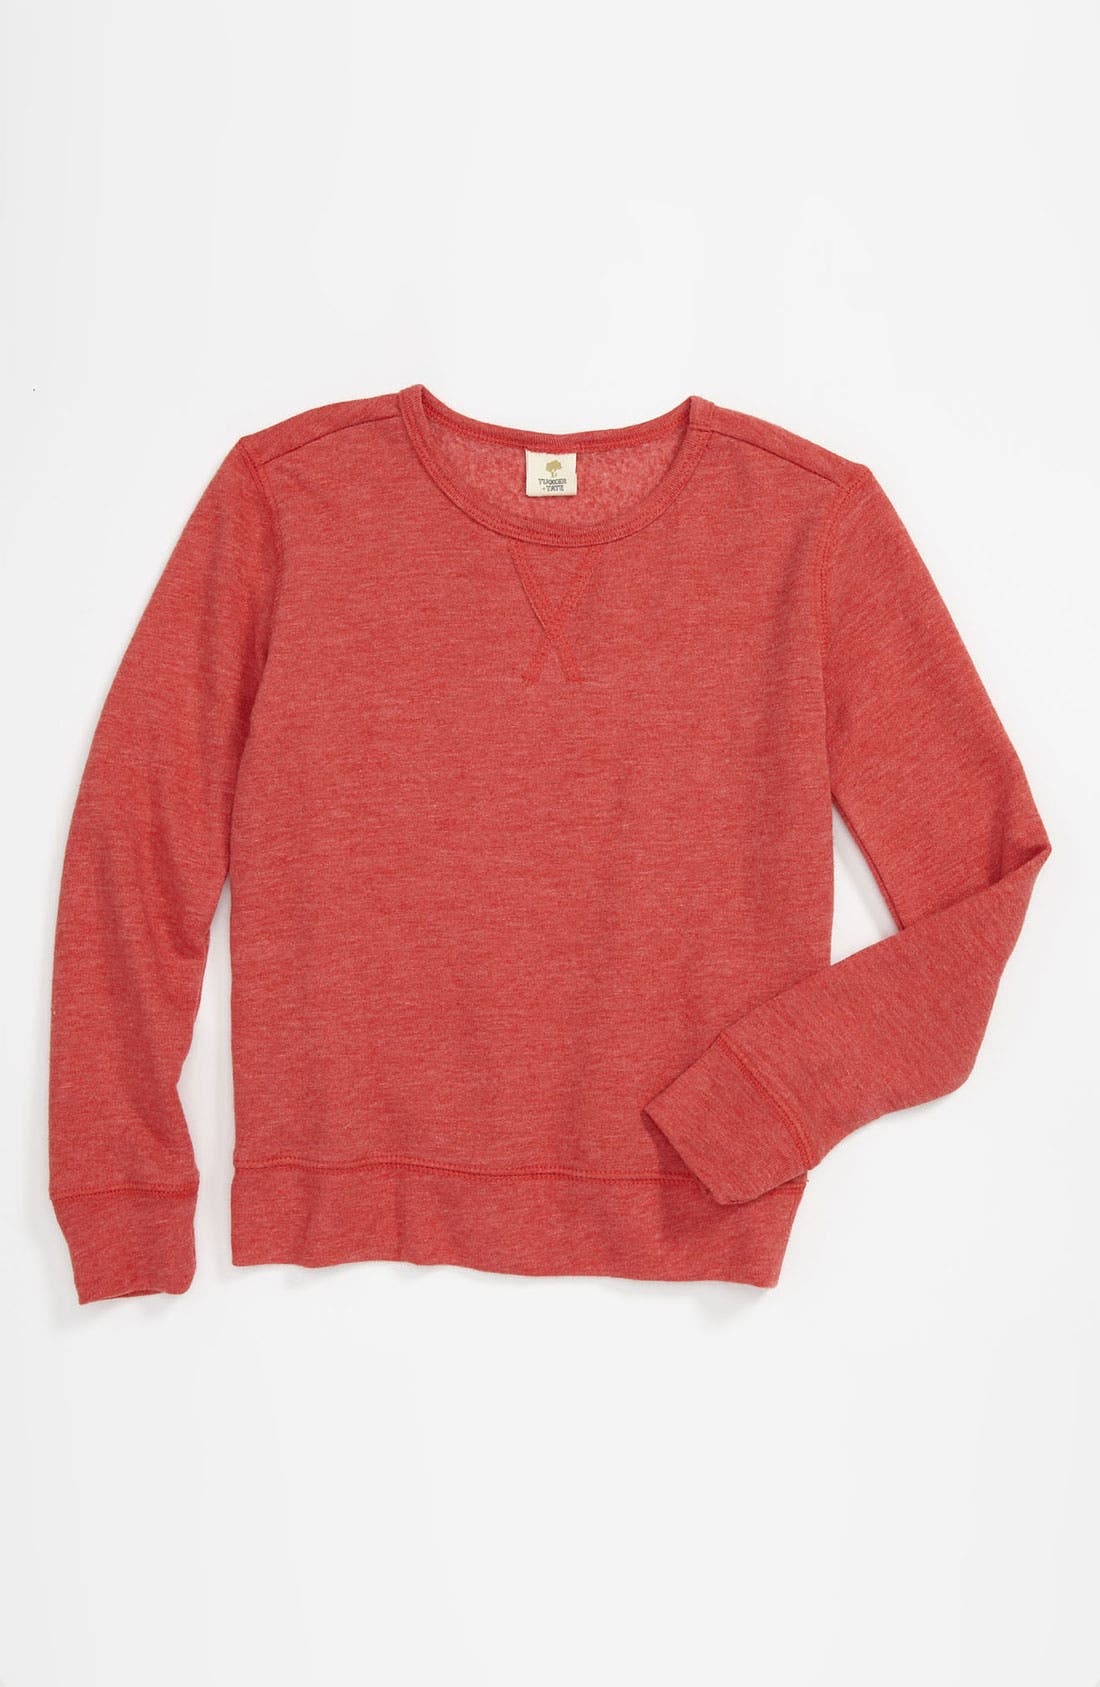 Alternate Image 1 Selected - Tucker + Tate Crewneck Sweatshirt (Toddler)